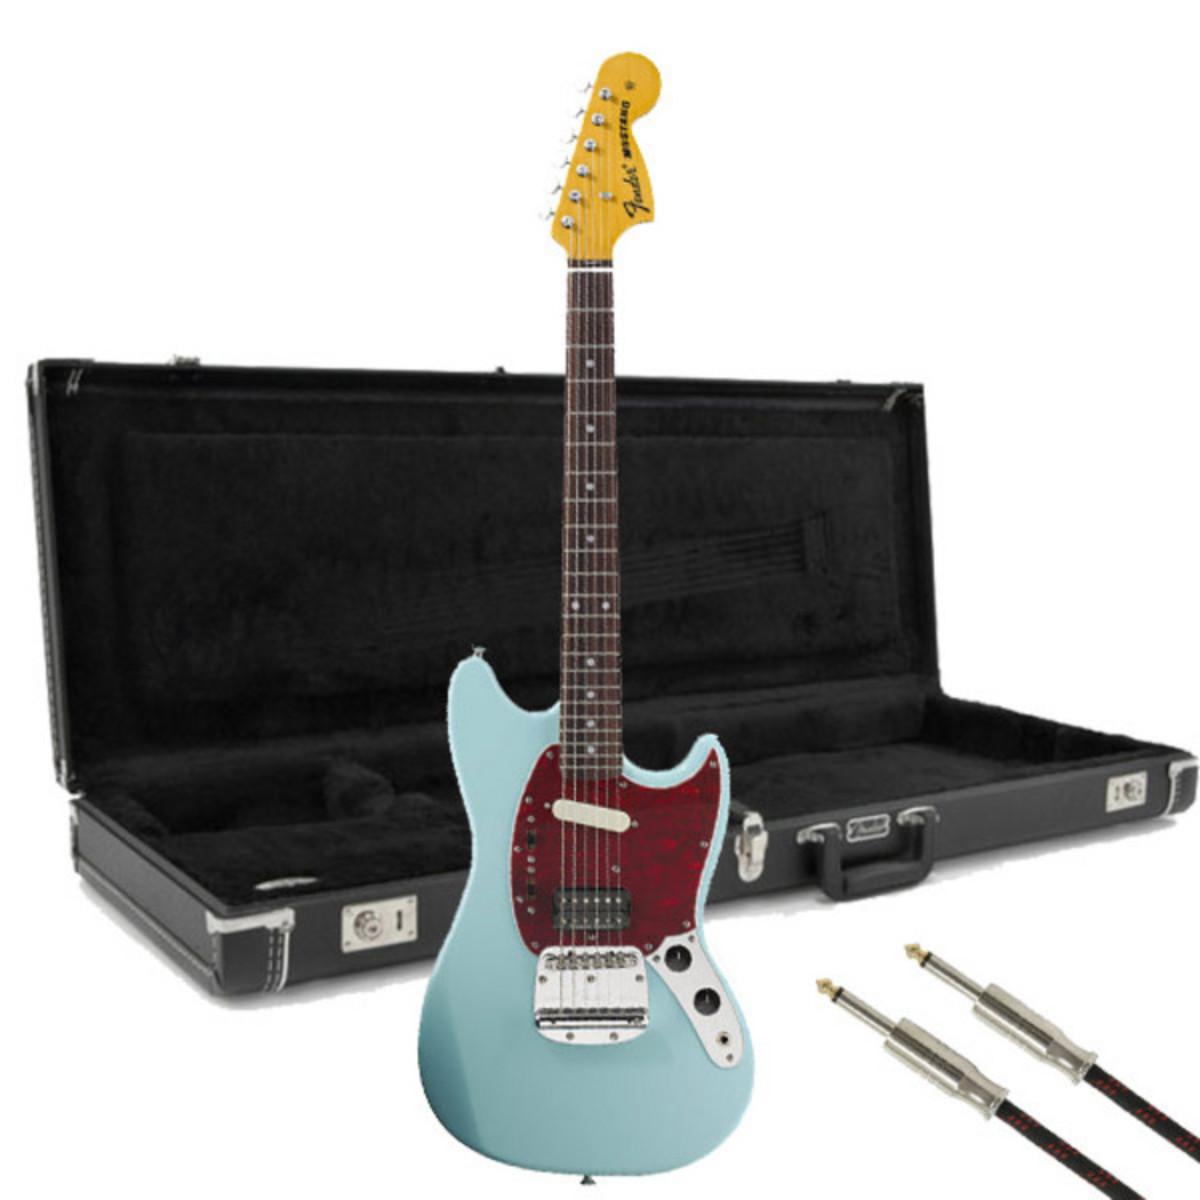 fender kurt cobain mustang signature guitar sonic blue free gift at. Black Bedroom Furniture Sets. Home Design Ideas